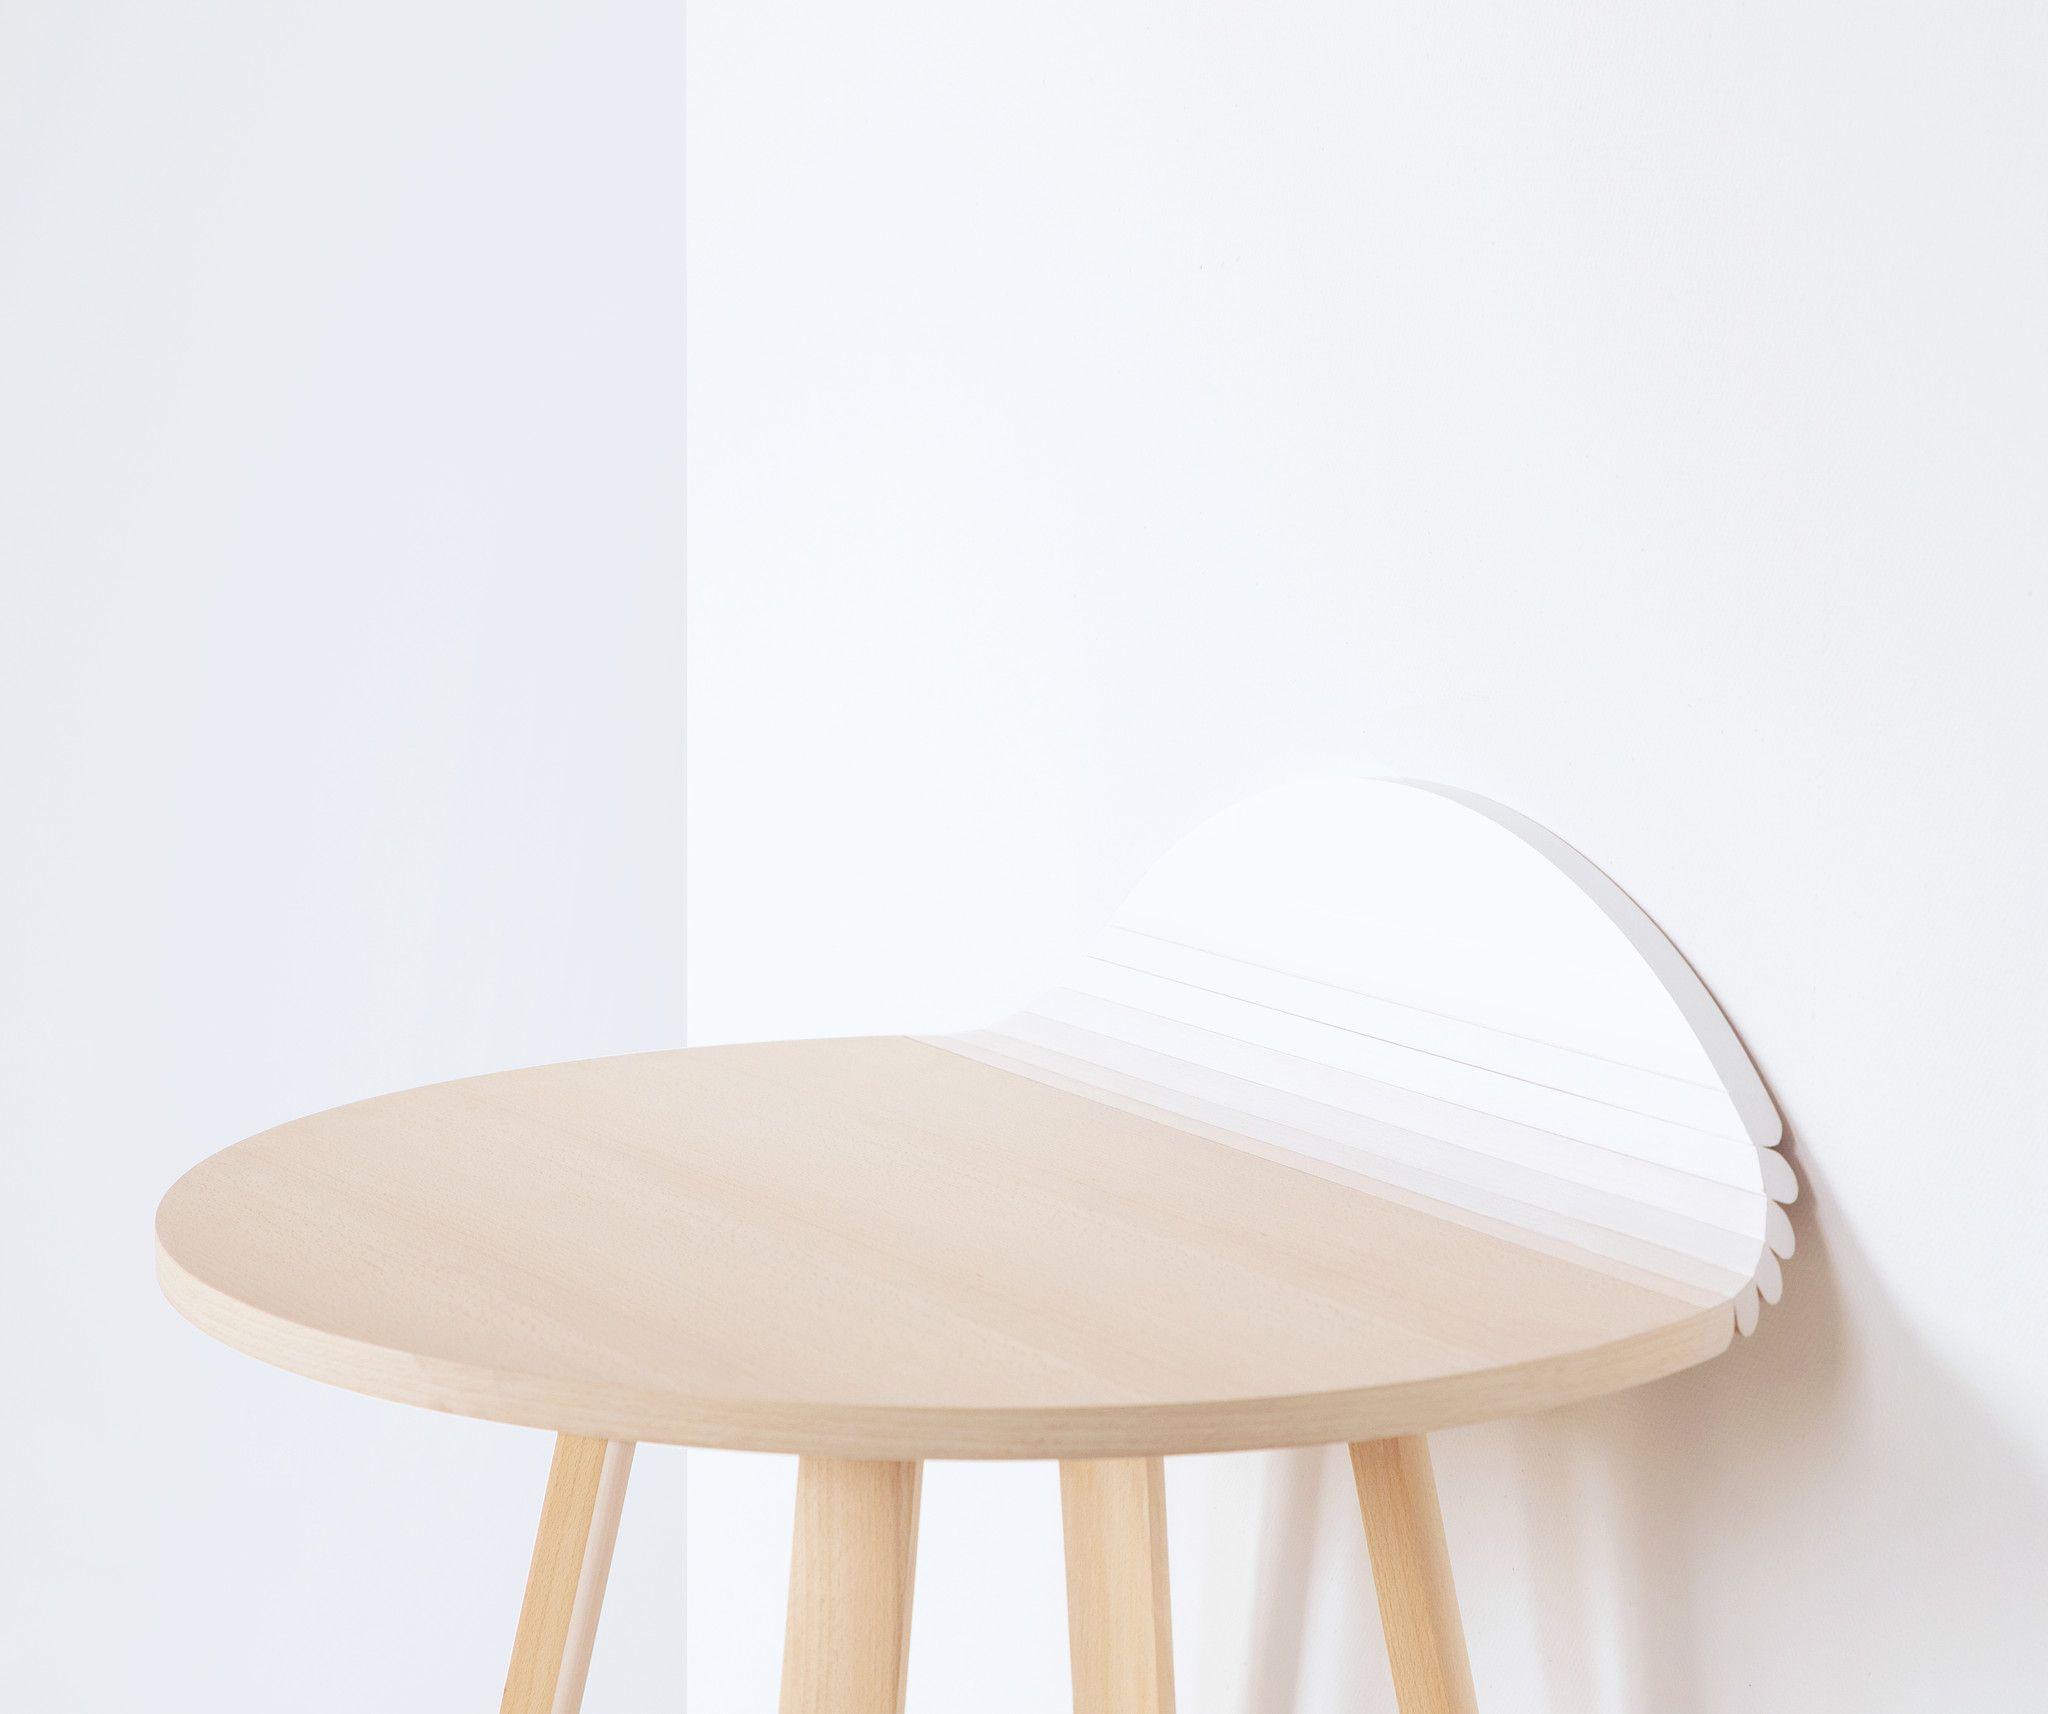 Dali round table from ziinlife modern furniture hong kong